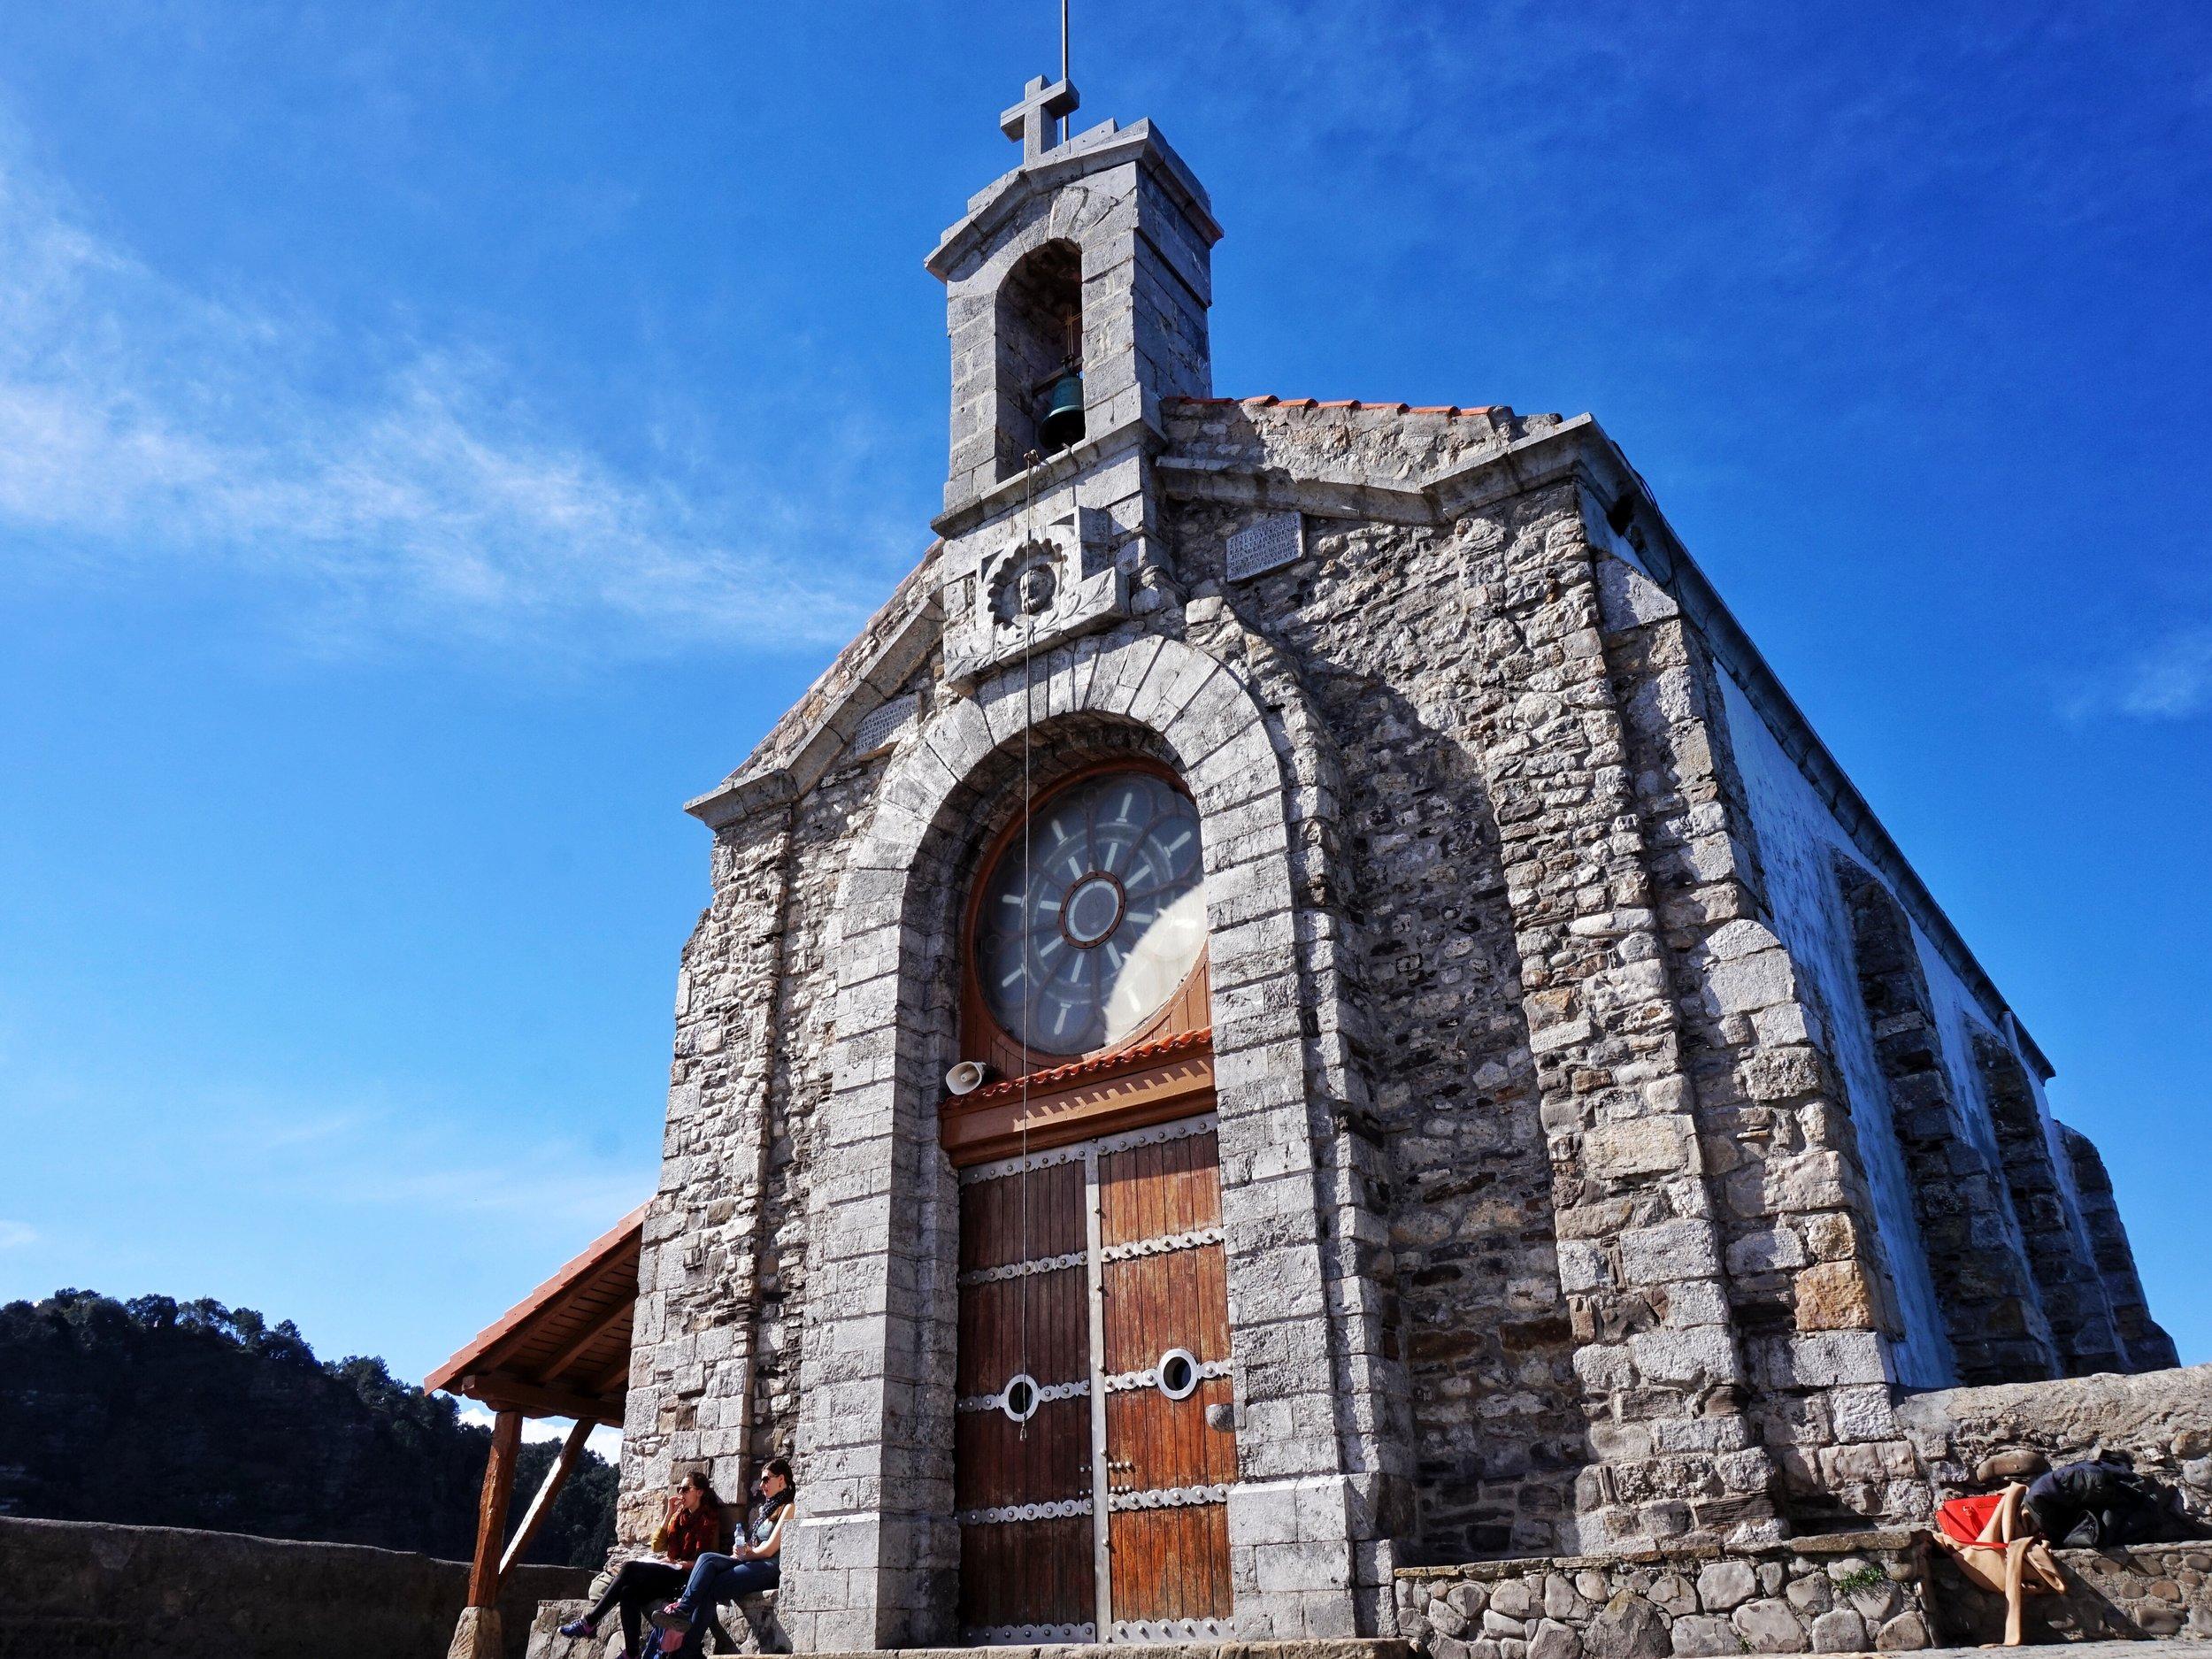 SAN JUAN DE GAZTELUGATXE'S CHURCH